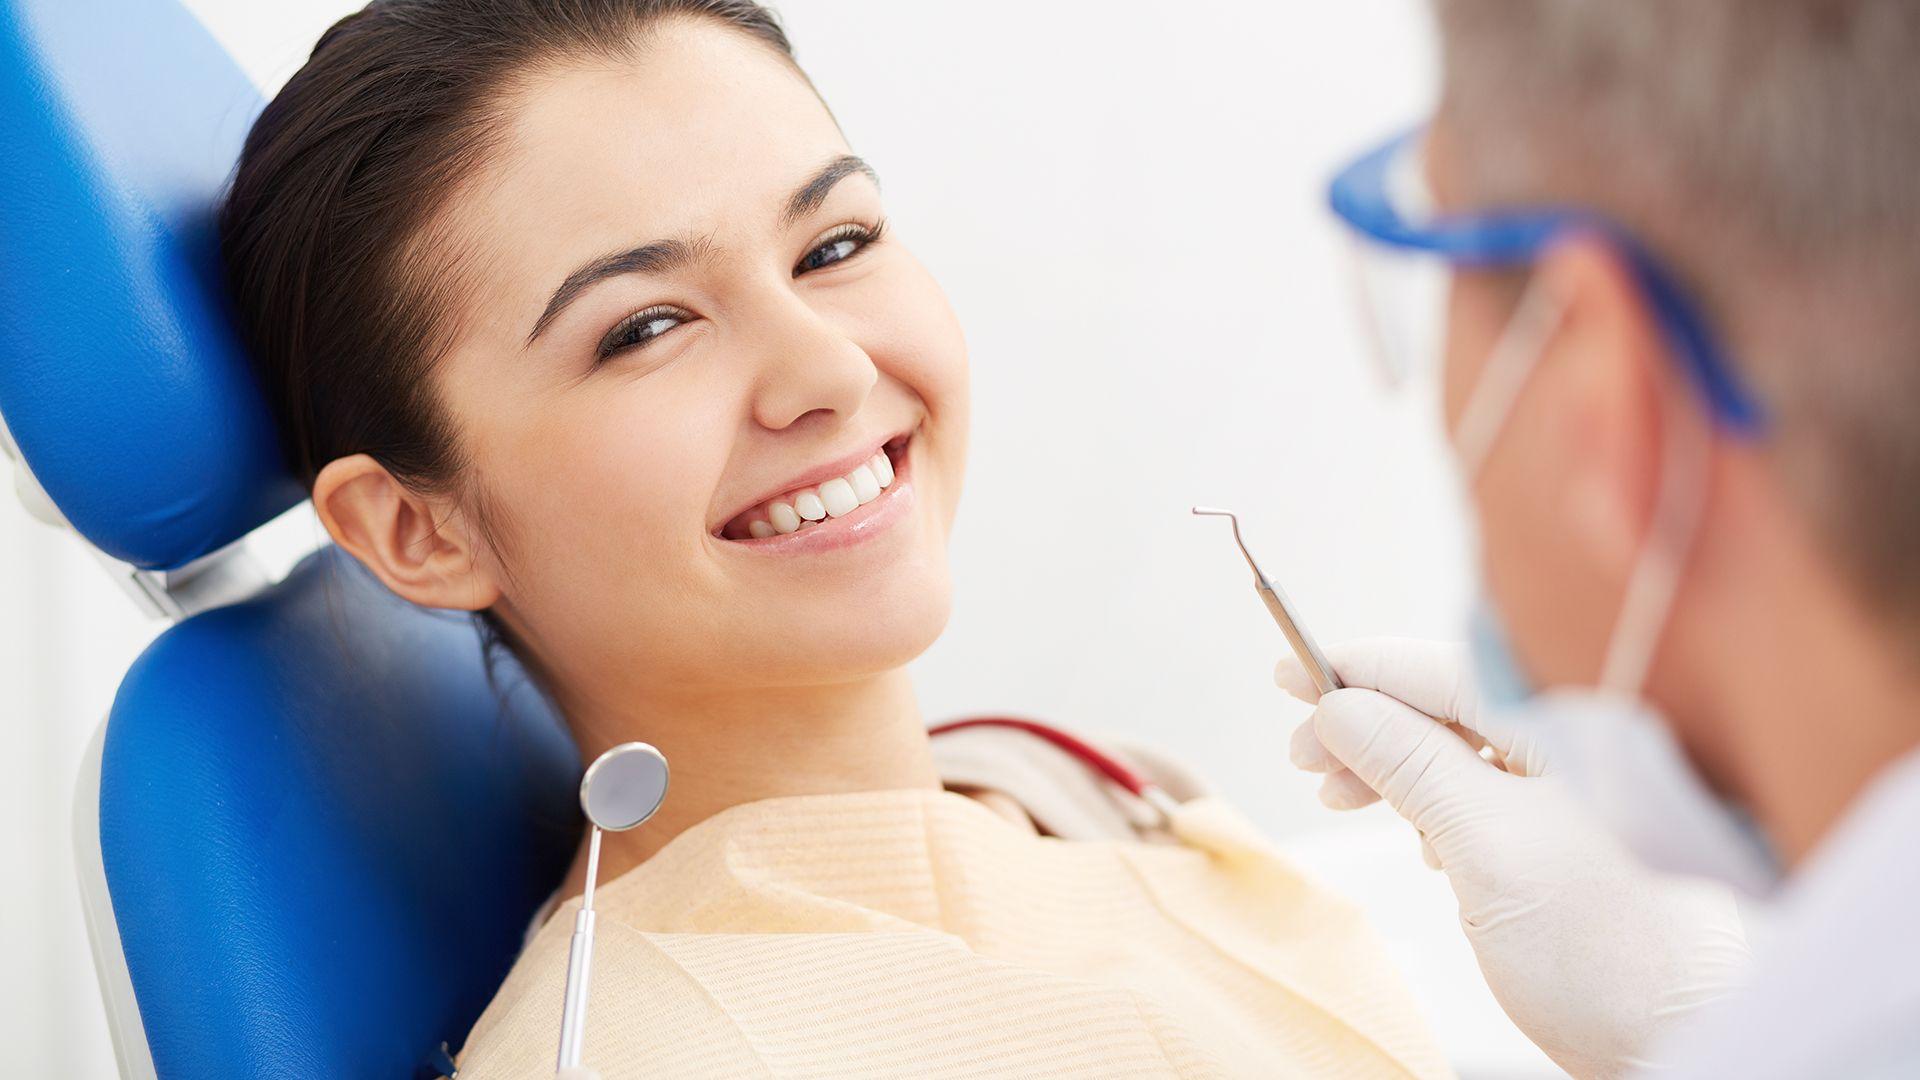 Clínicas de ortodoncia de Asturias